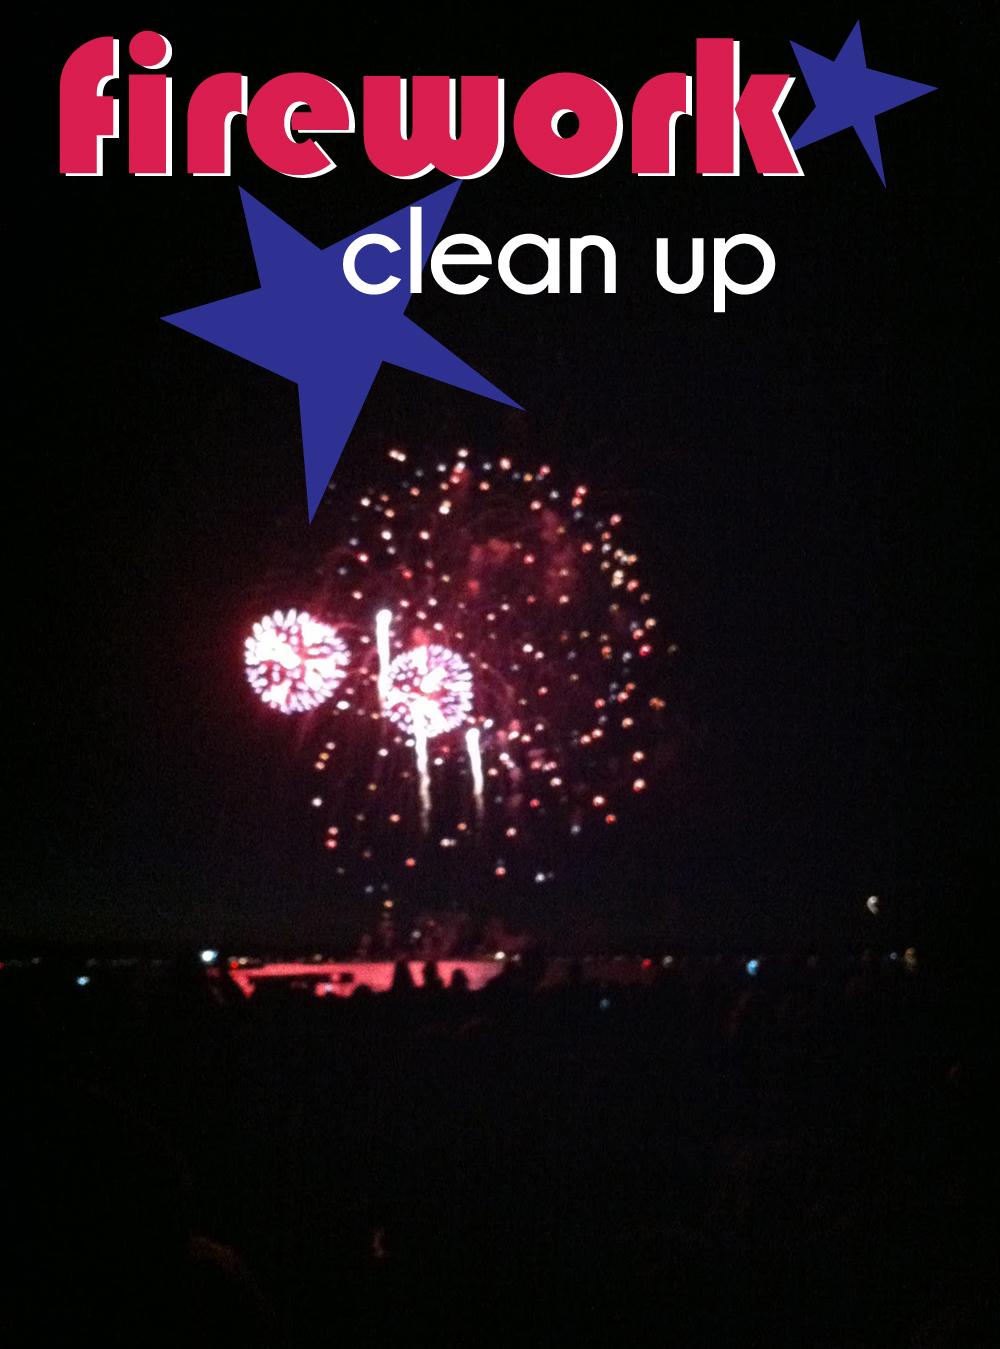 firework cleanup